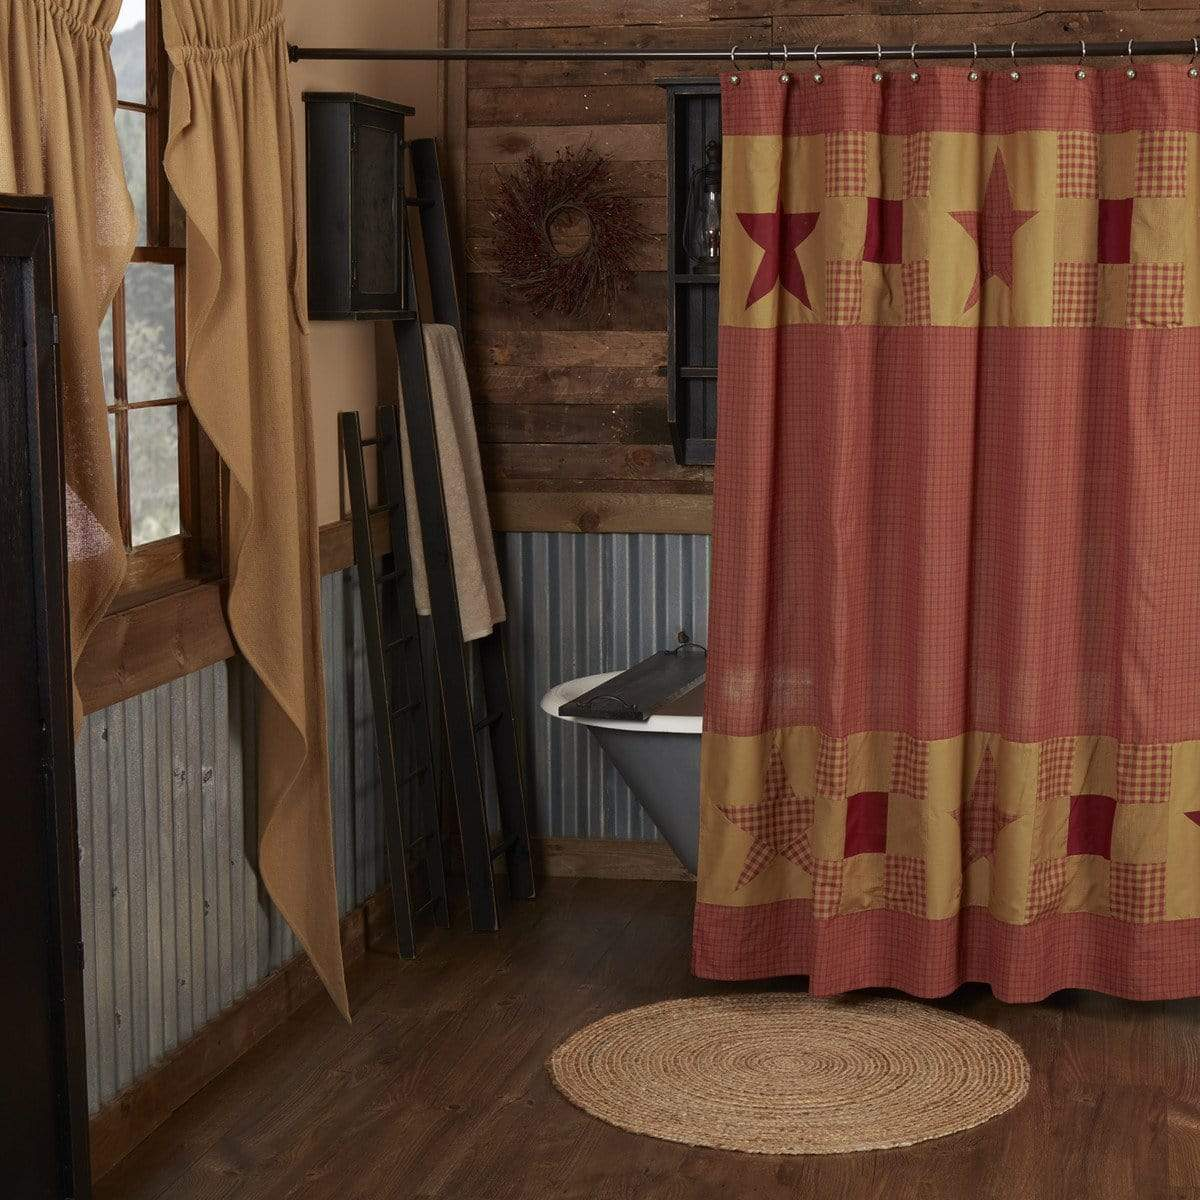 ninepatch star shower curtain